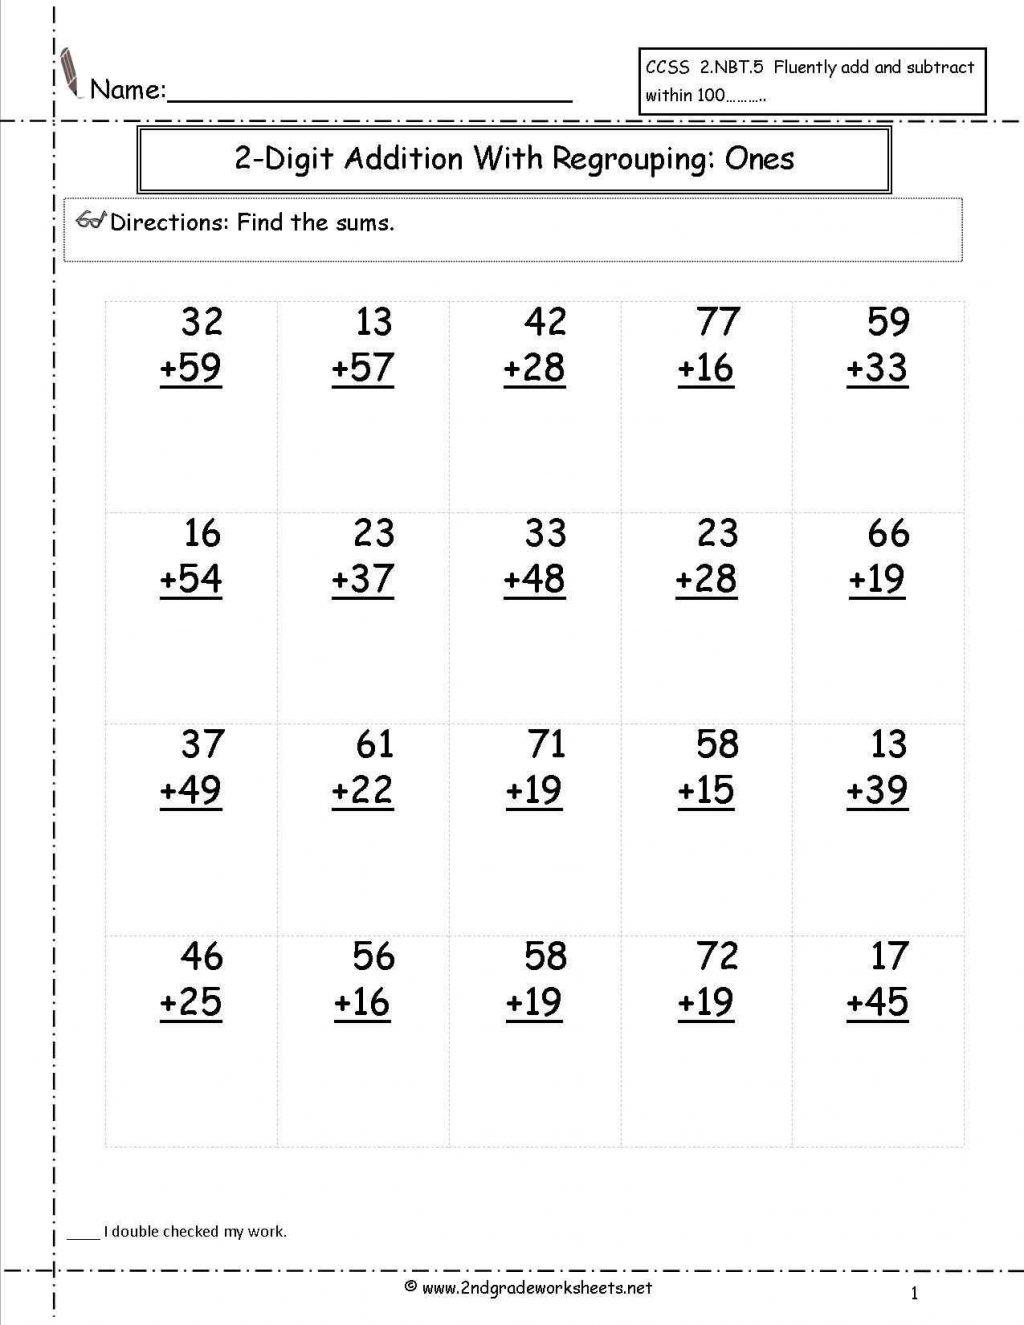 Spreadsheet Part Crossword Within Spreadsheet Part Crossword Abbr Clue On App Free For  Pywrapper